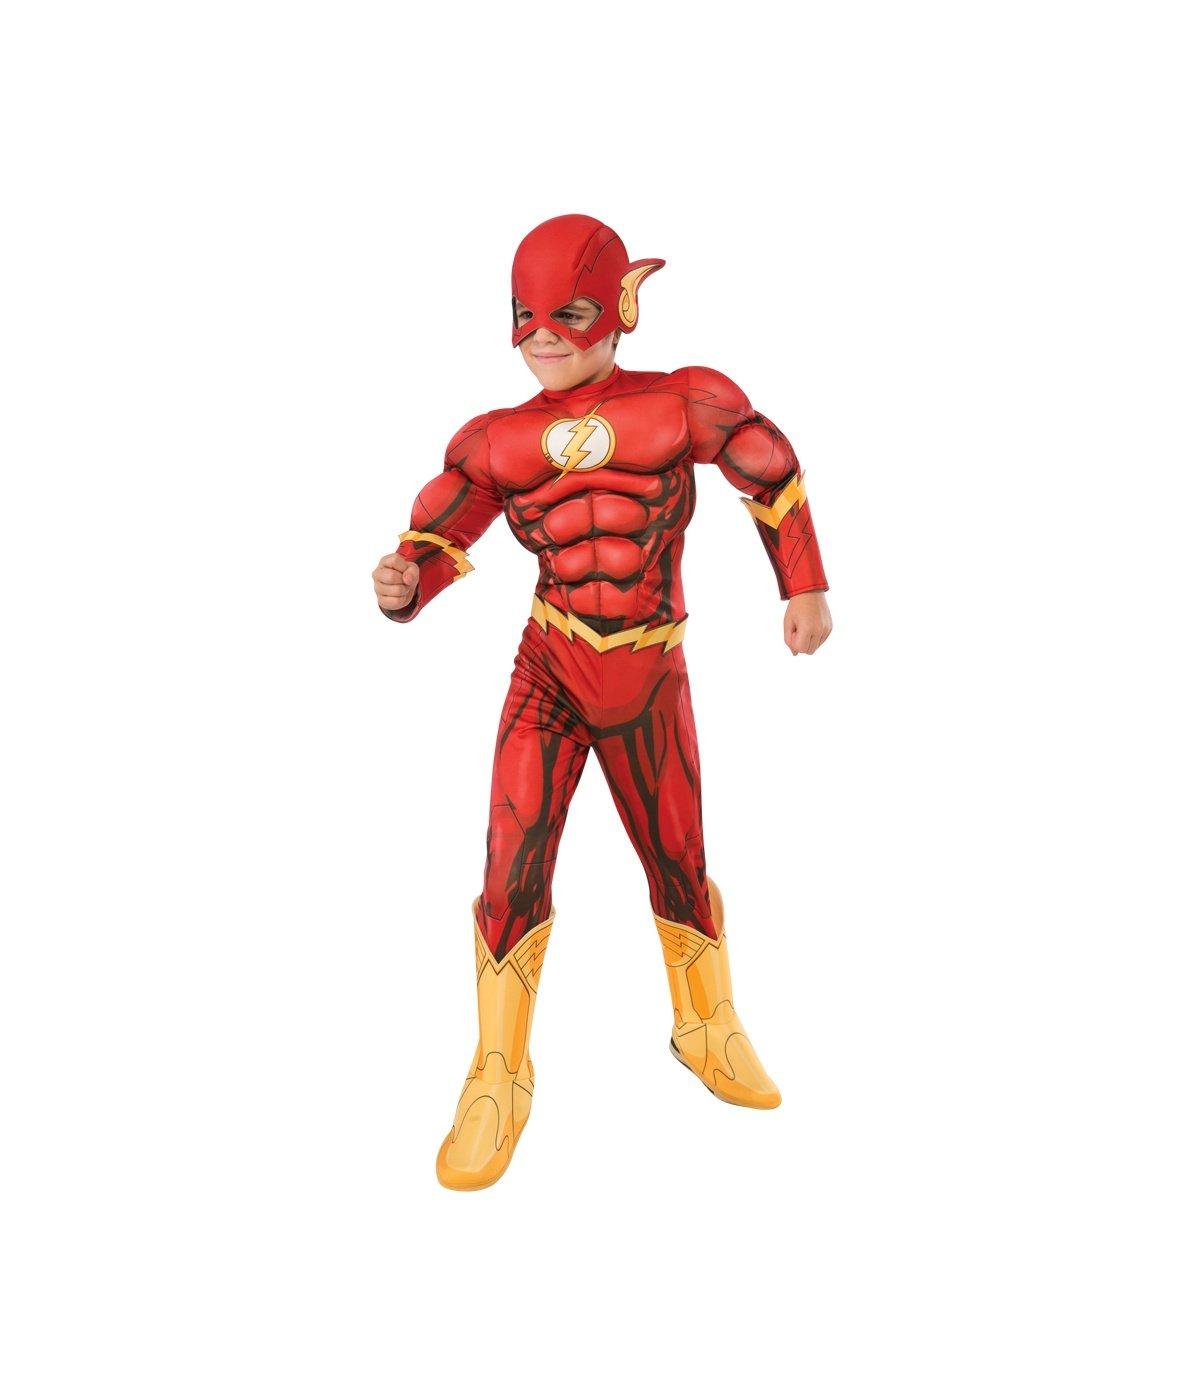 Big Boys' Dc Comics the Flash New 52 Superhero Muscle Costume deluxe